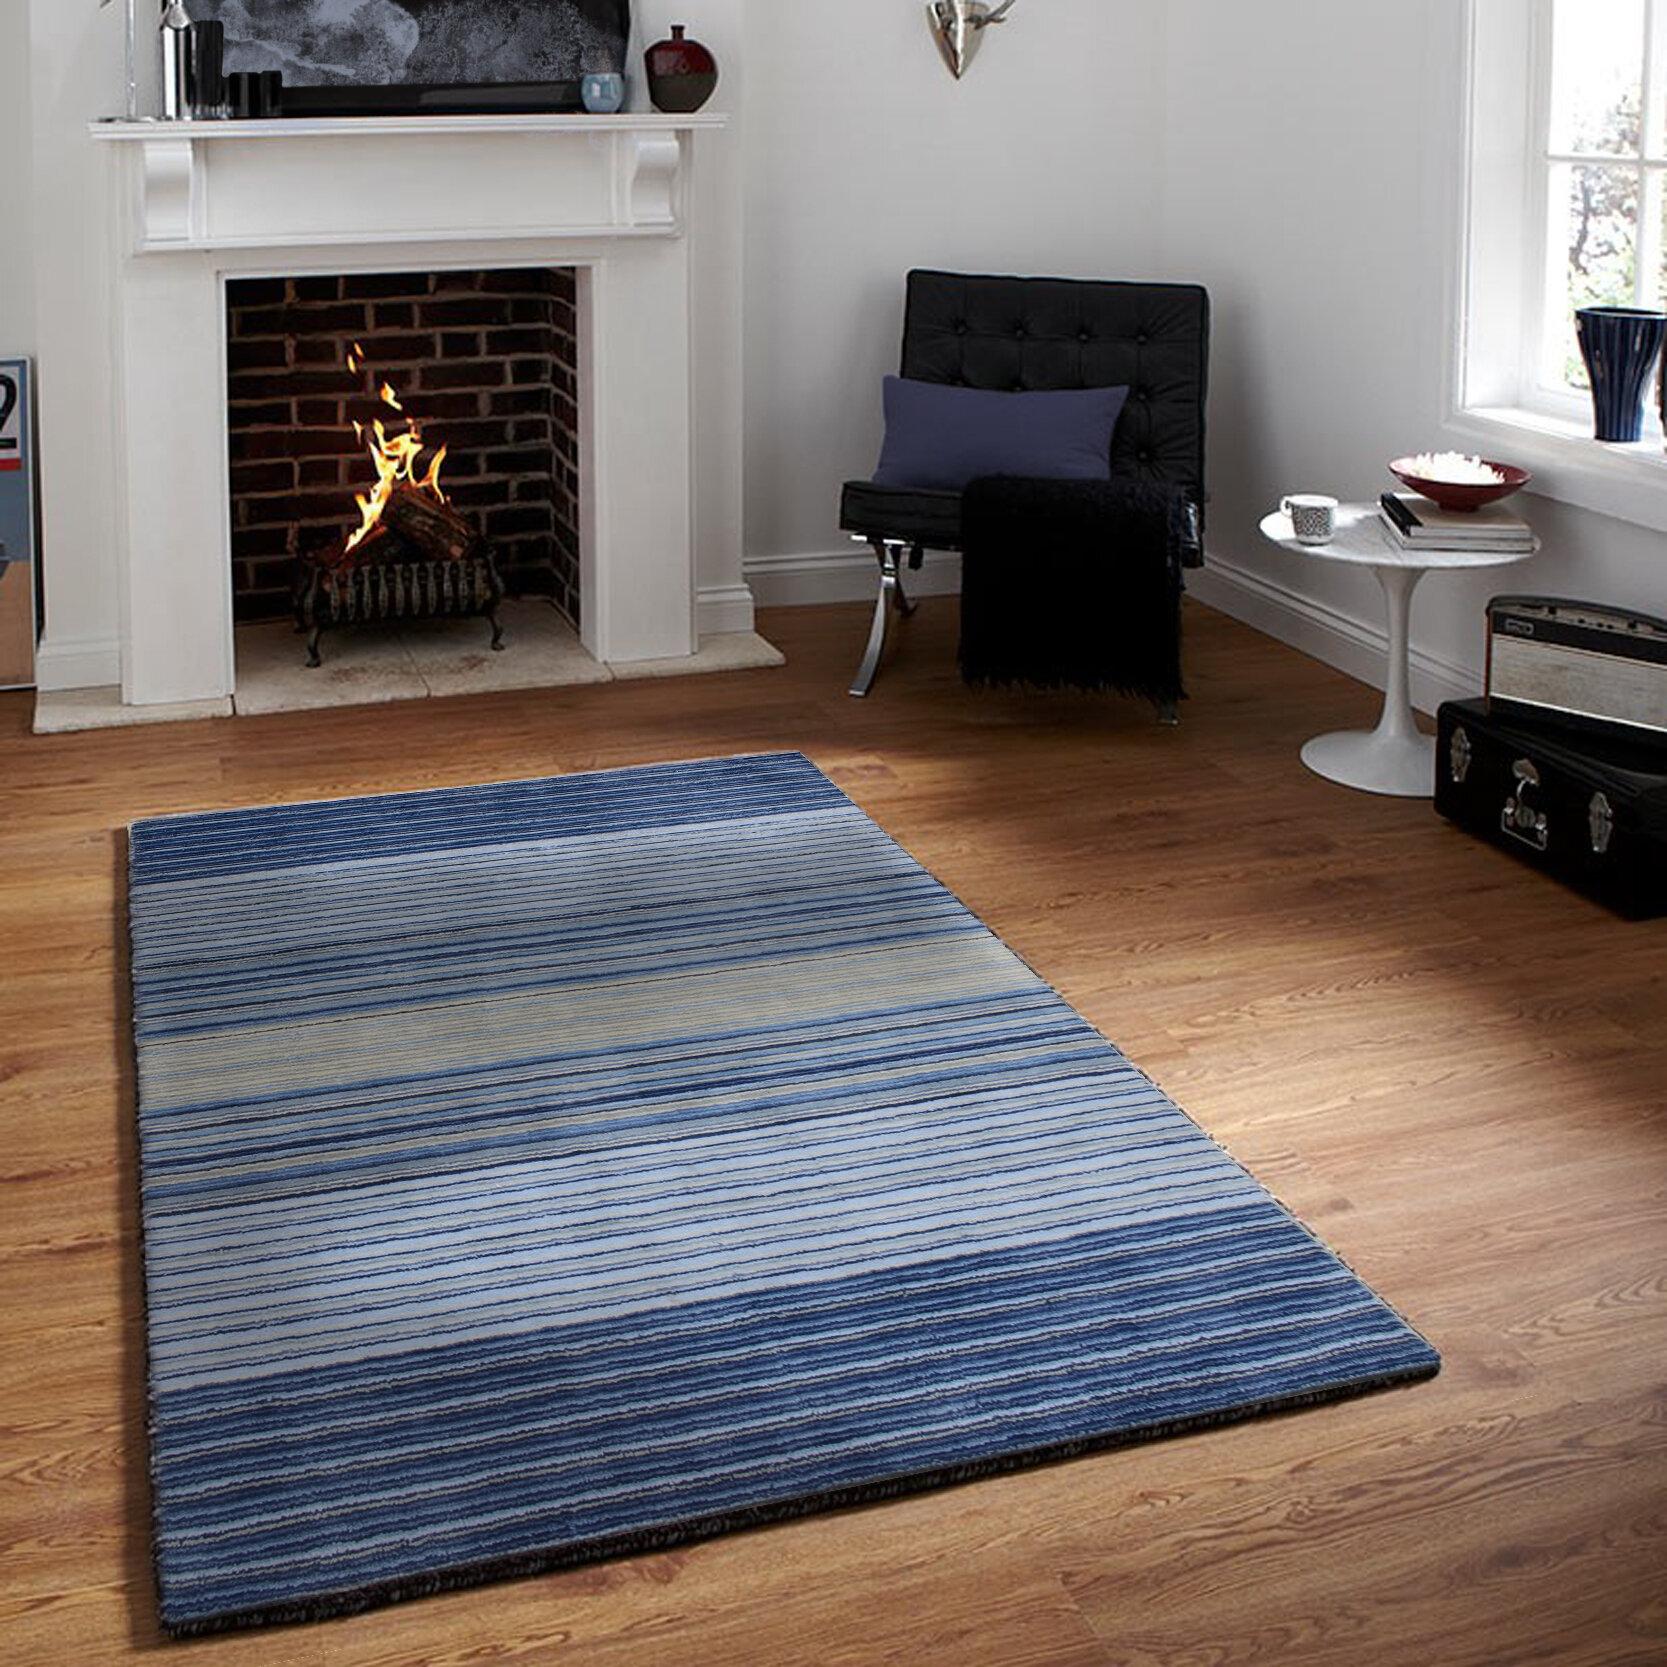 Orren Ellis Nathans Striped Handmade Tufted Wool Blue Area Rug Reviews Wayfair